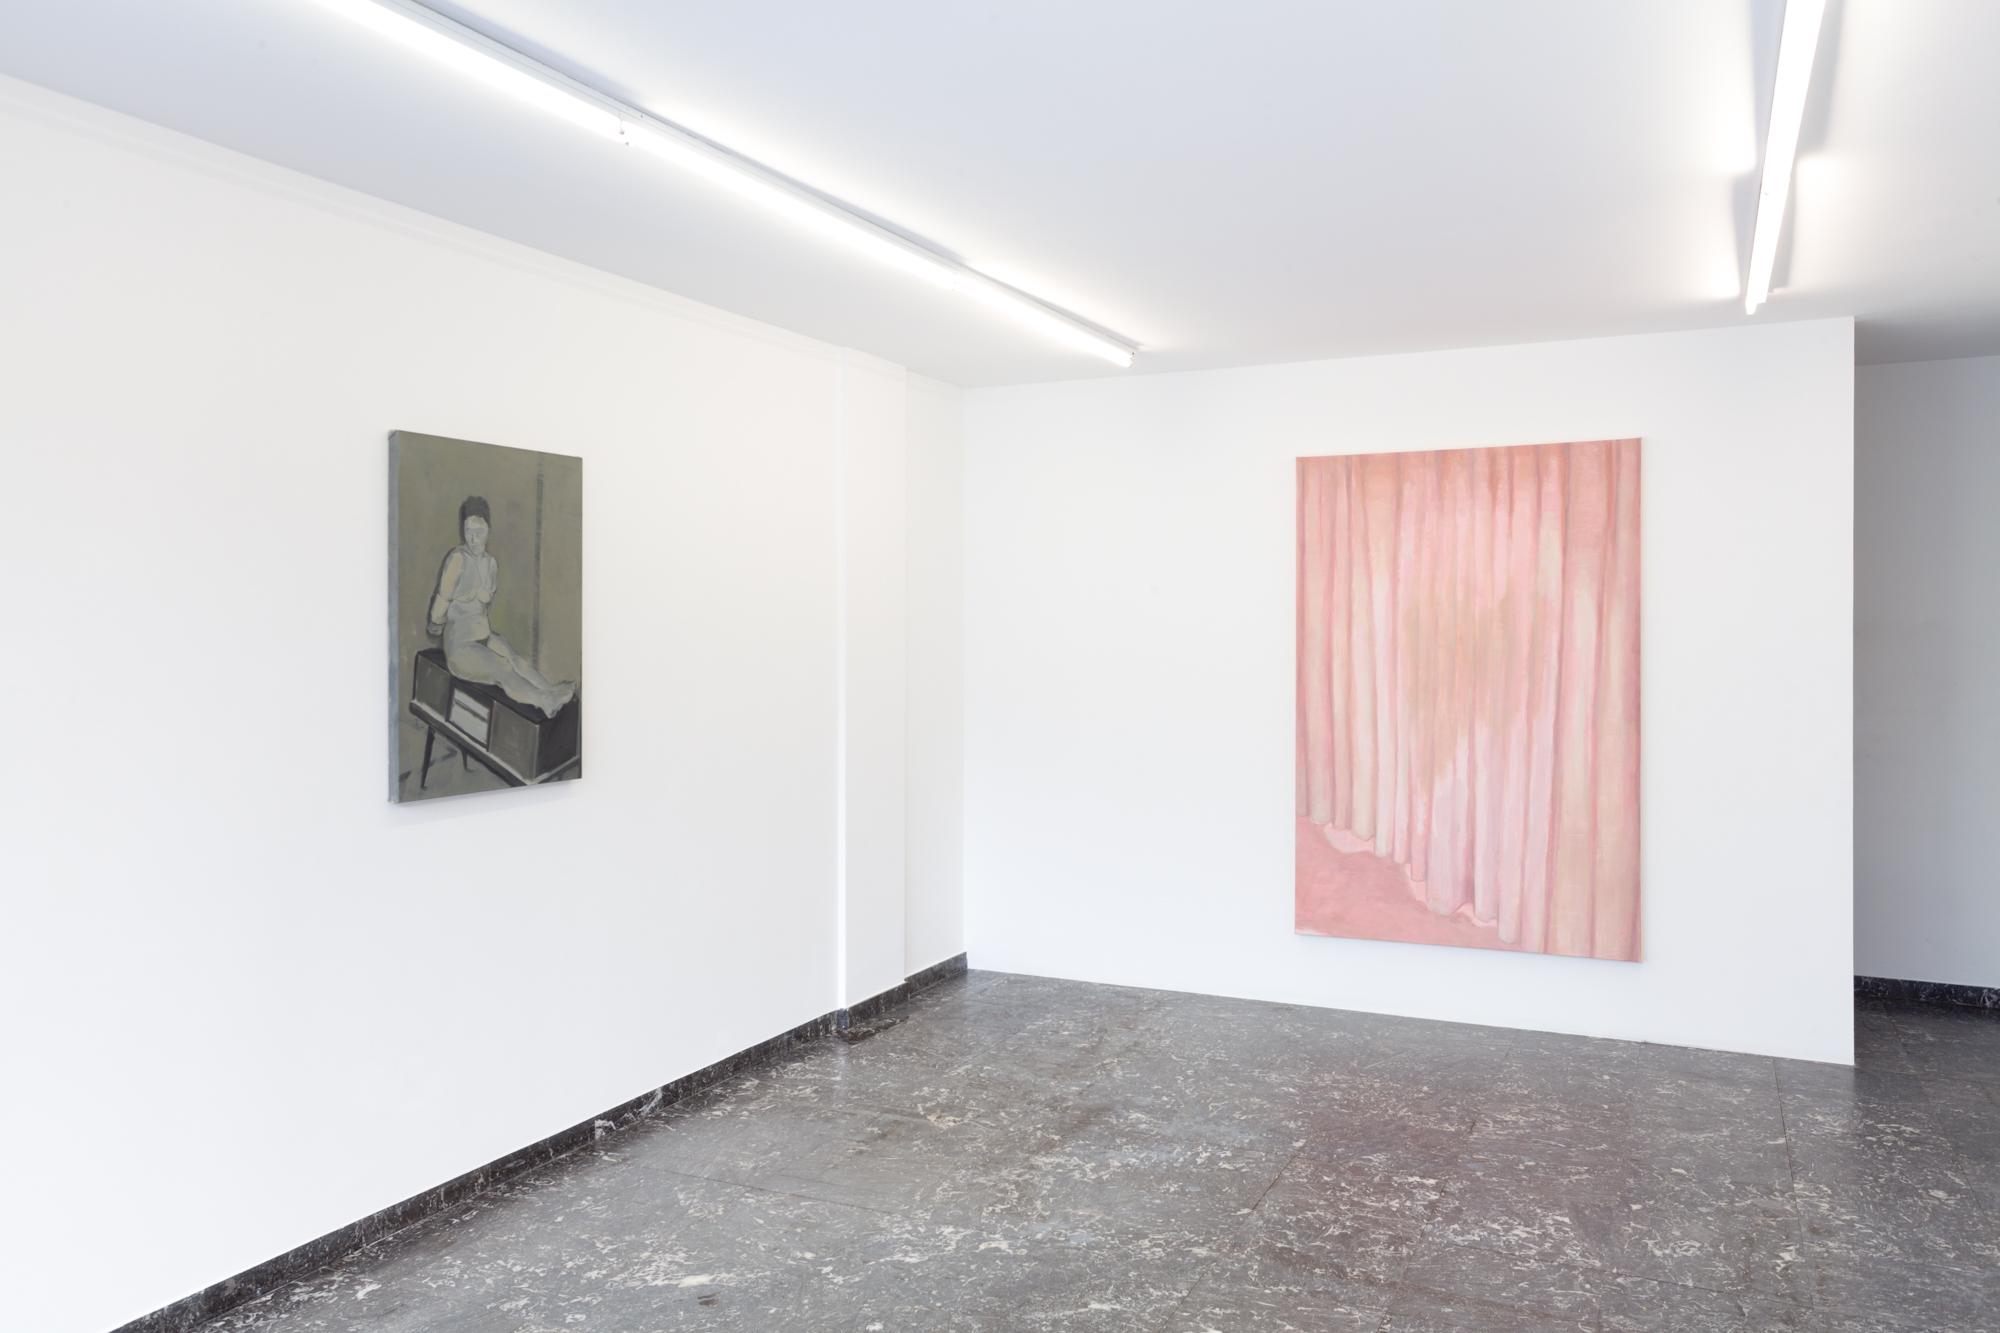 Guy Van Bossche, Underground No Floor, Installation view, TICK TACK Antwerp, Photo by Pieter Huybrechts.